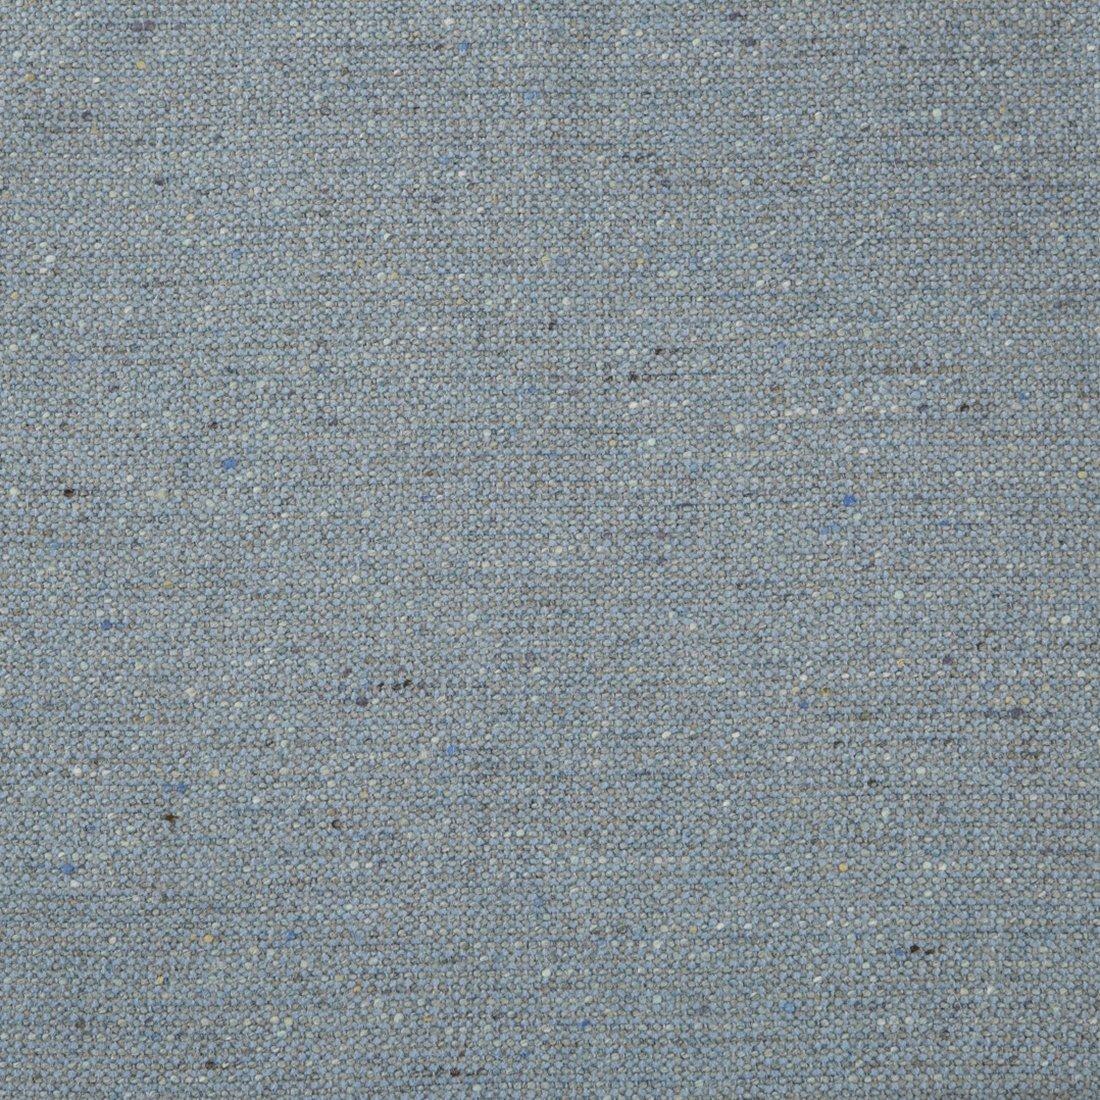 Amazon Com Aquamarine Wool Blue Aqua Teal Solid Woven Wool